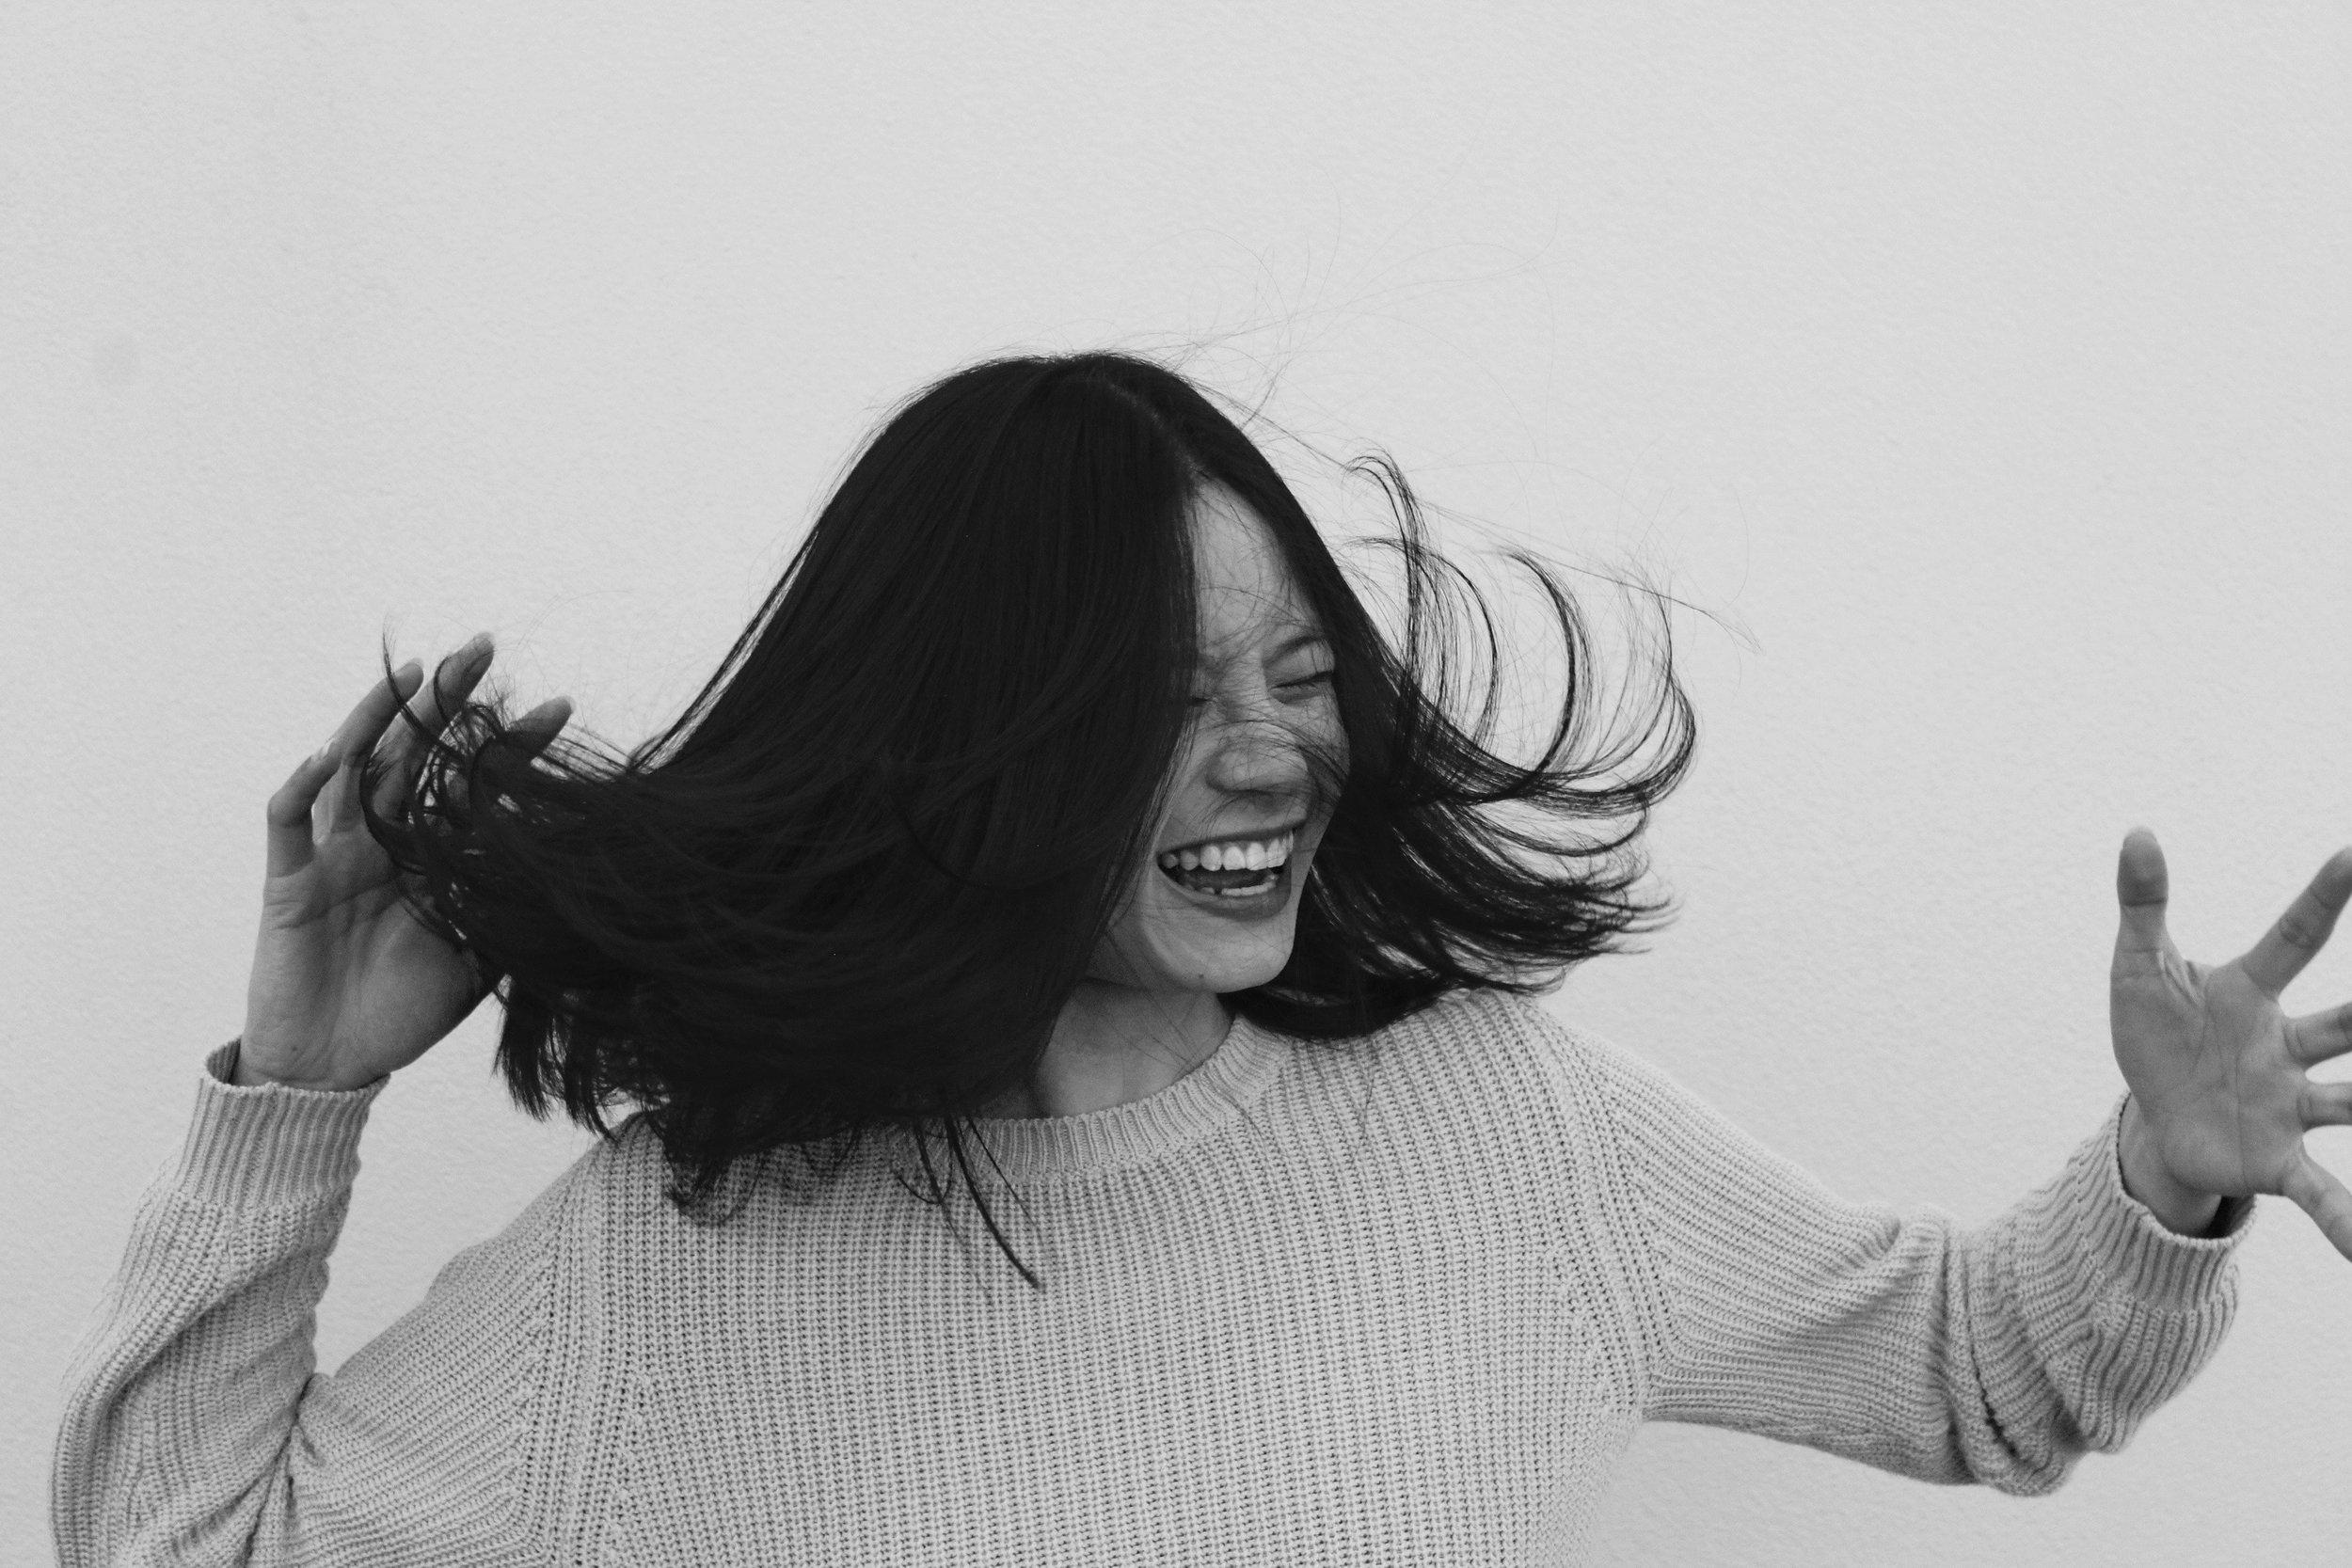 5 Ways to Ground Yourself - By Carina Devi